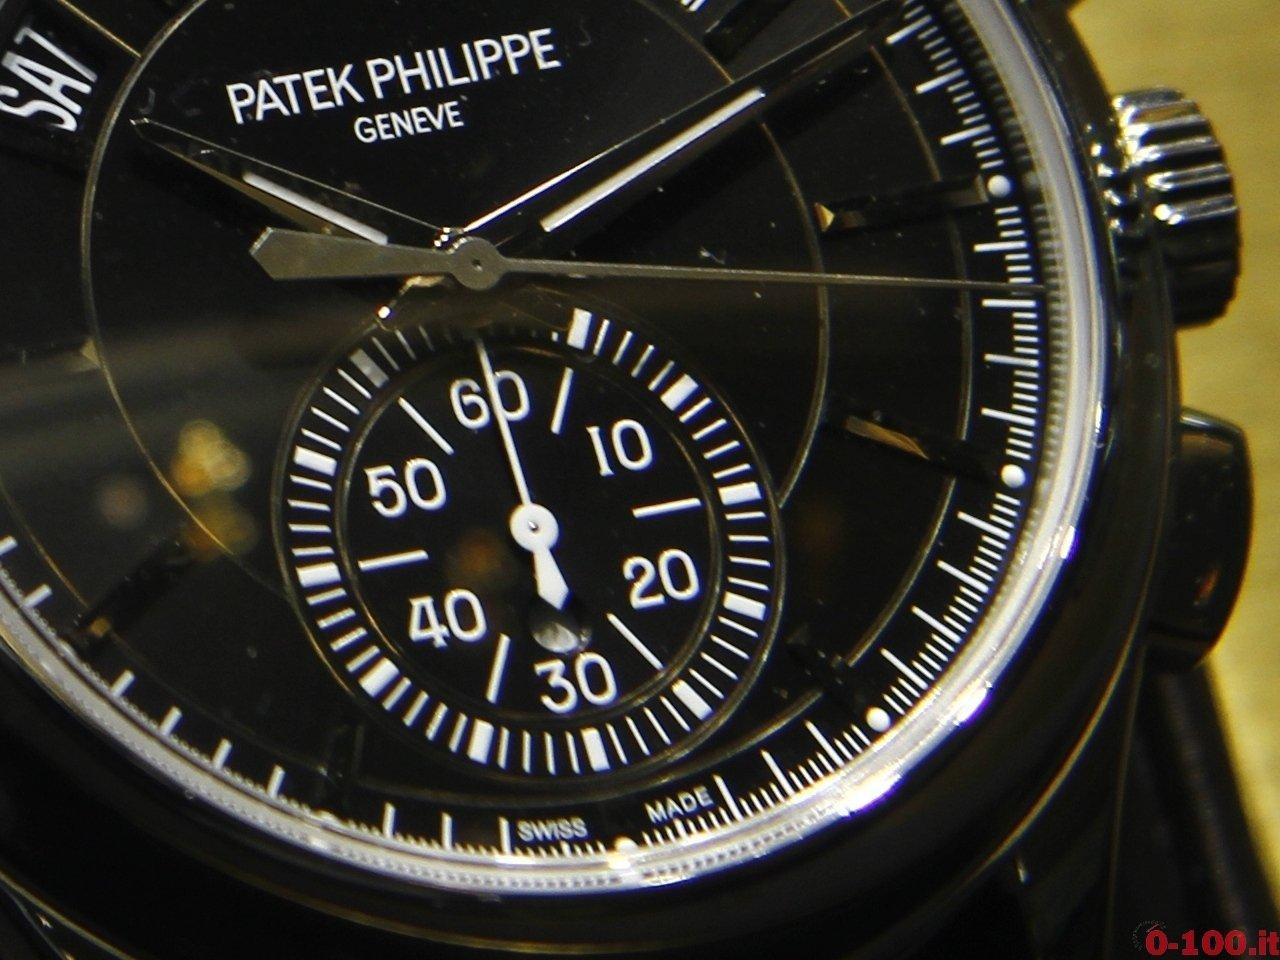 baselworld-2015-patek-philippe-calendario-annuale-cronografo-0-100_4